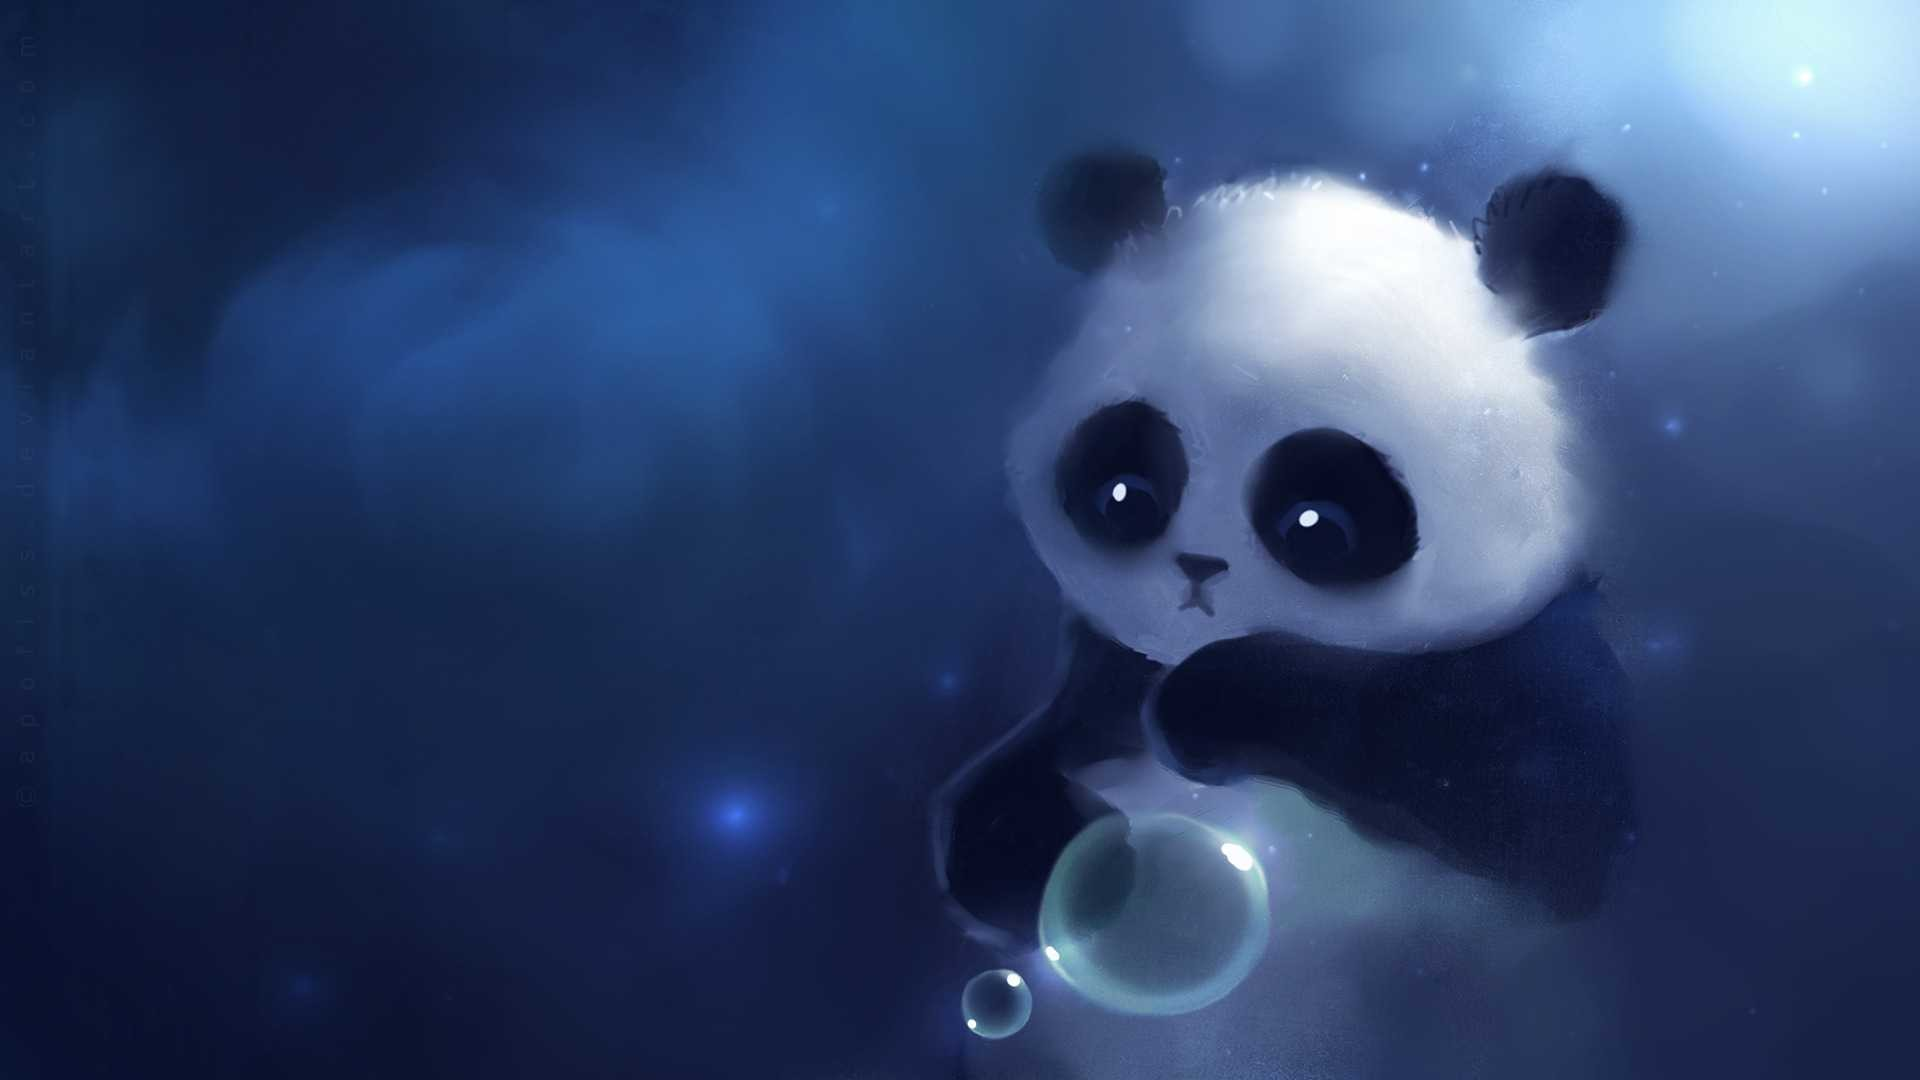 Res: 1920x1080, Photos Of Cute Panda Animals Wallpaper Anime Animal Hd Pics Iphone